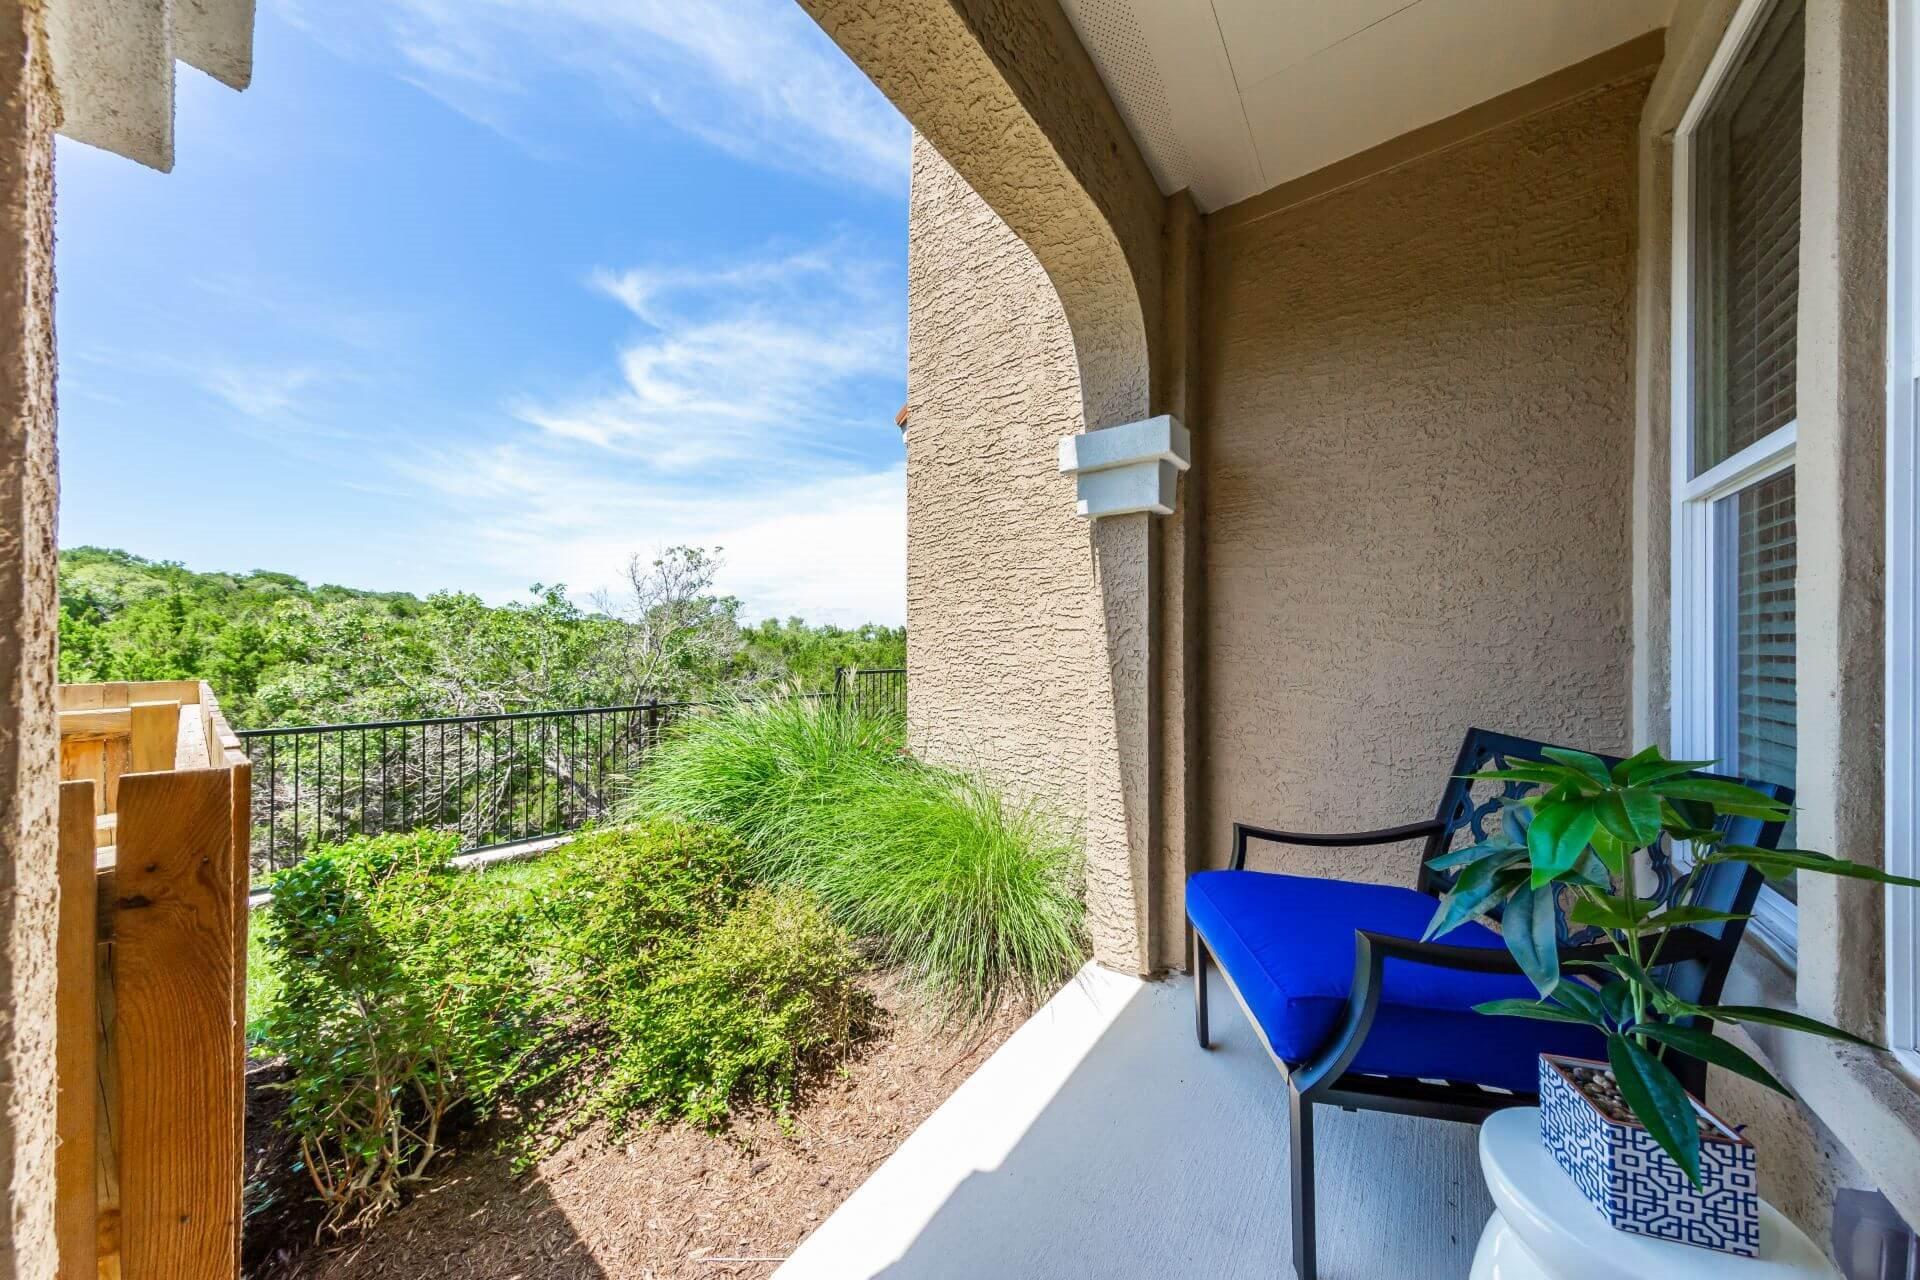 Spacious Patio With Sitting Arrangements at Berkshire Lakeway, Lakeway, Texas